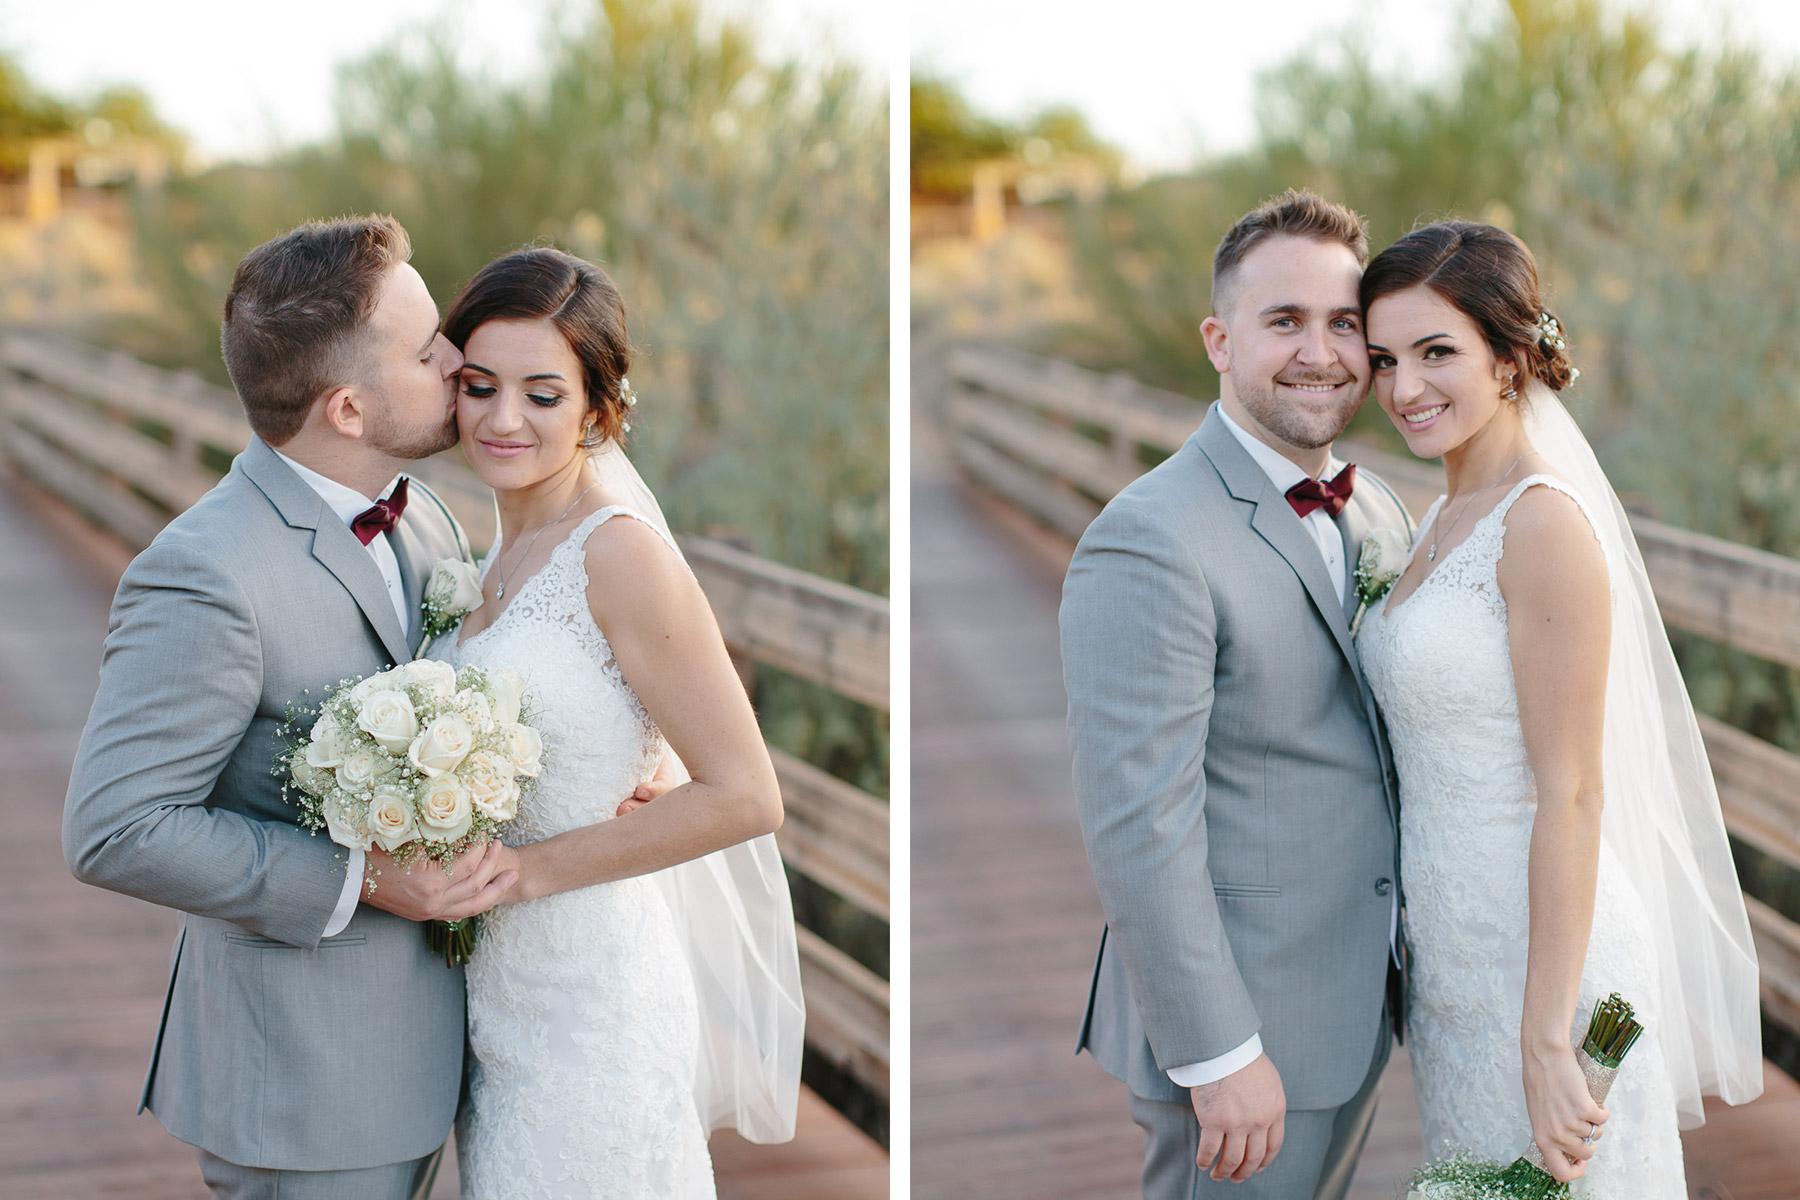 161210-Luxium-Weddings-Arizona-Matt-Jenny-Anthem-Golf-Country-Club-1053a.jpg